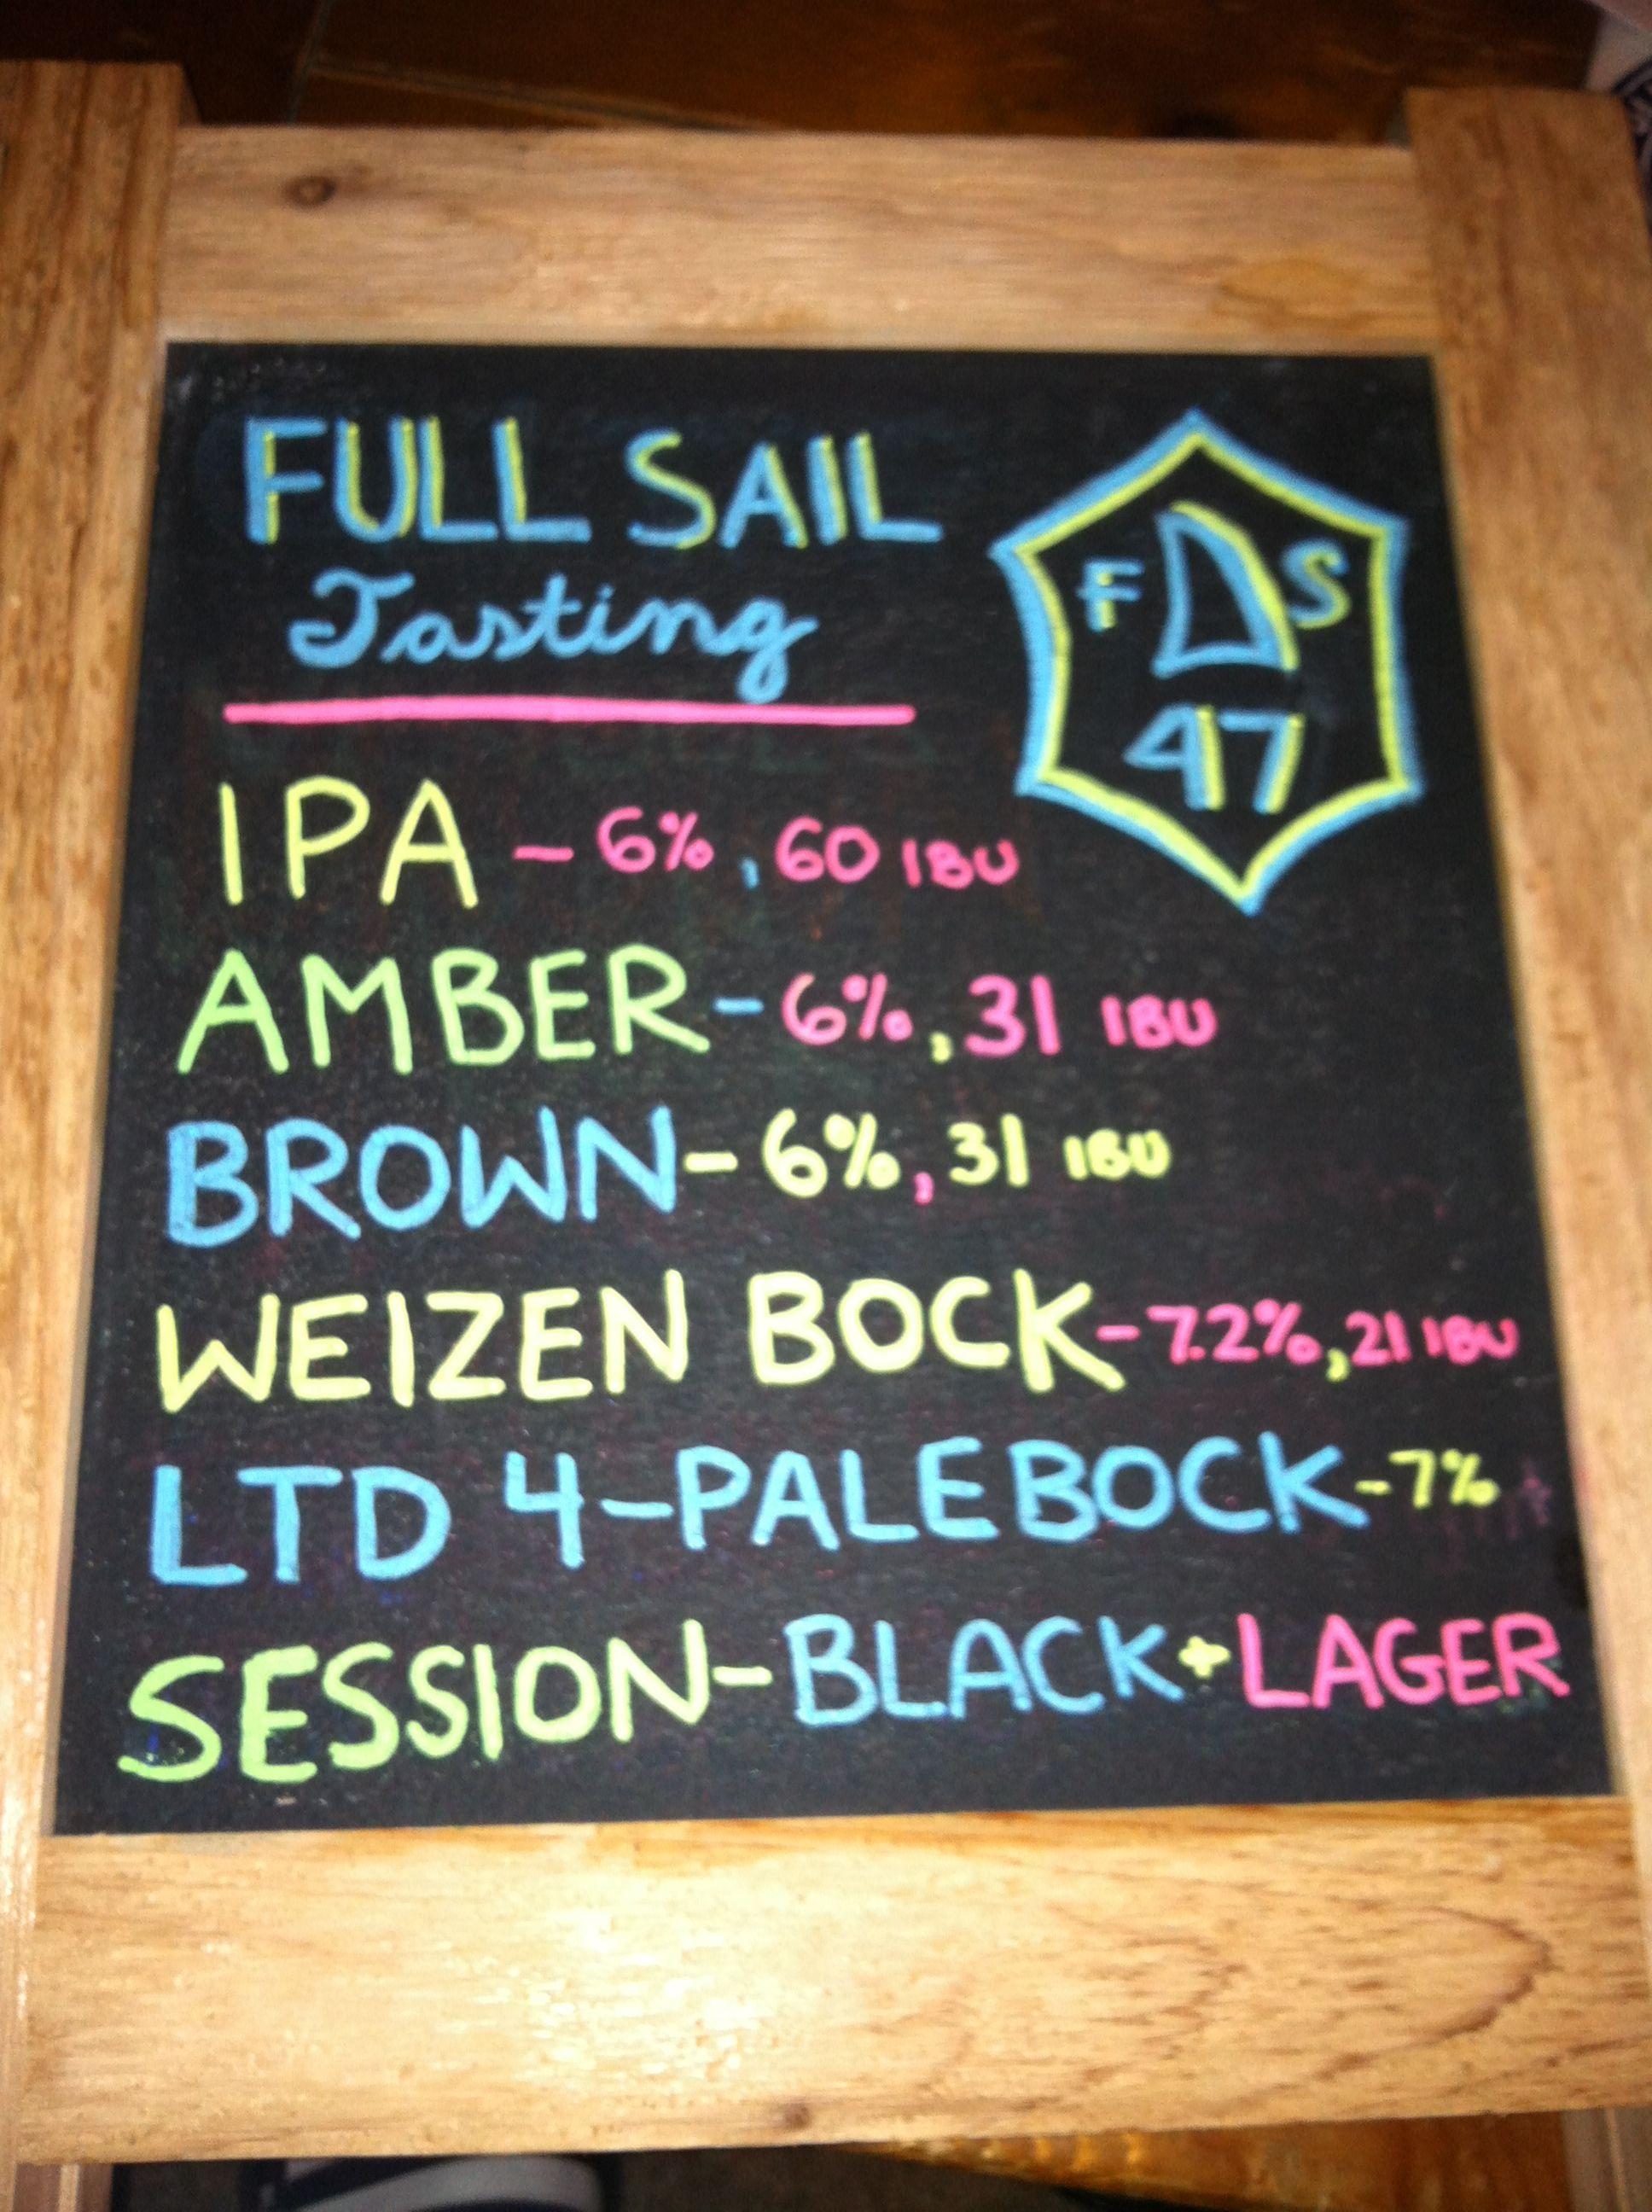 Pin by Keith Mader on Demo displays/ beer fest Beer fest